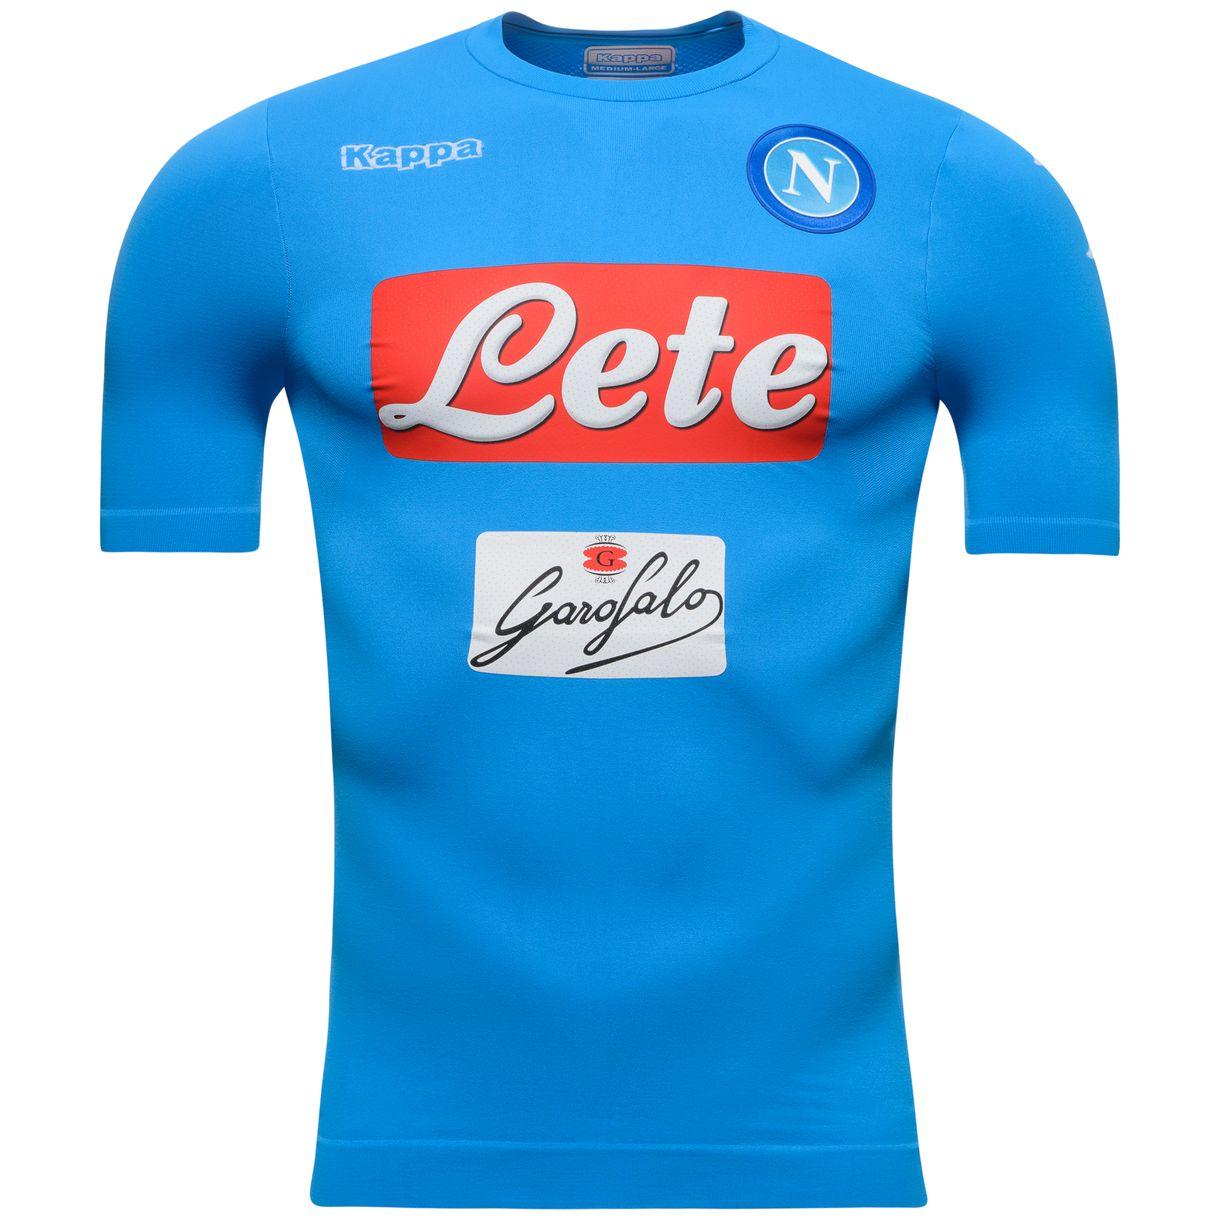 Napoli 2016-2017 Authentic Home Shirt  302HBB0  -  53.10 Teamzo.com 12173cf476a2b